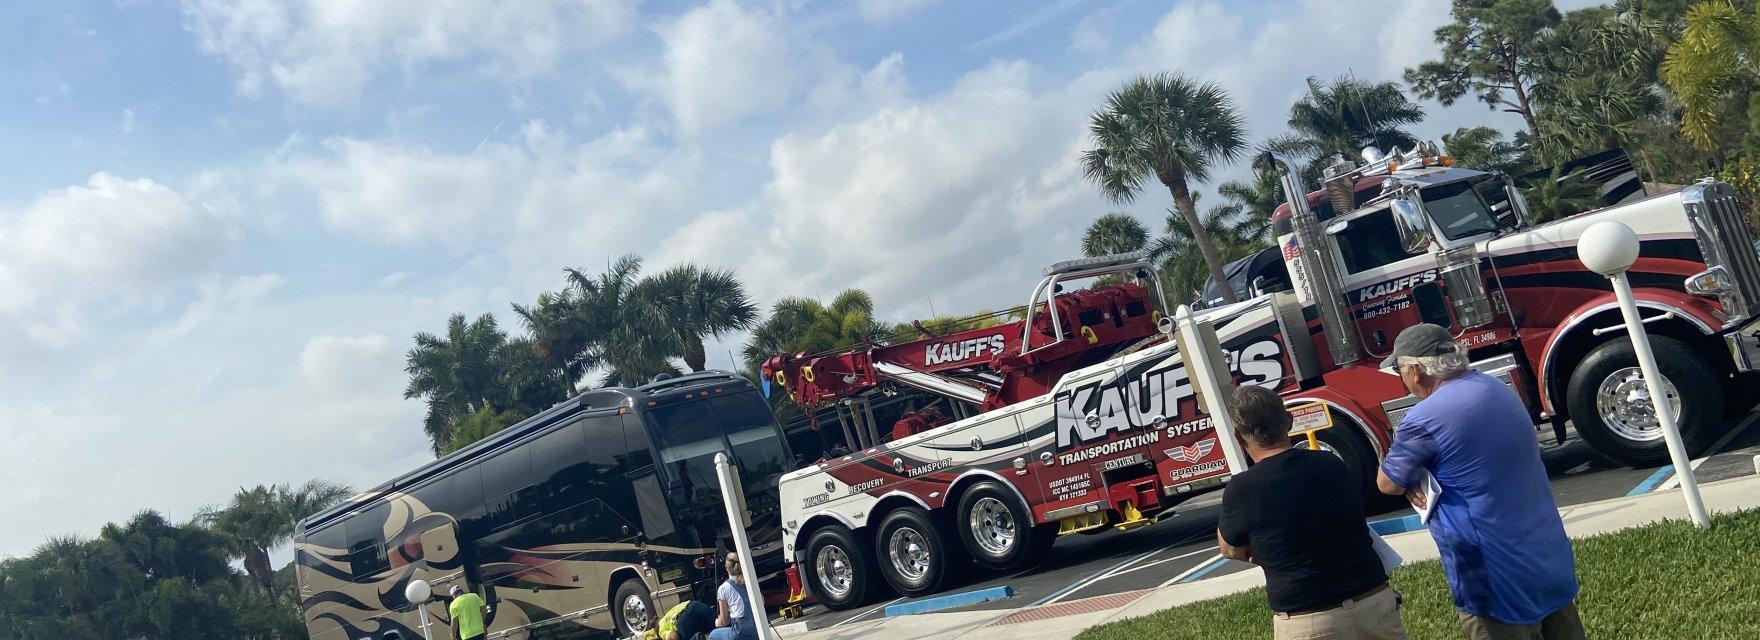 Kauff's heavy-duty tow truck lifting motor coach